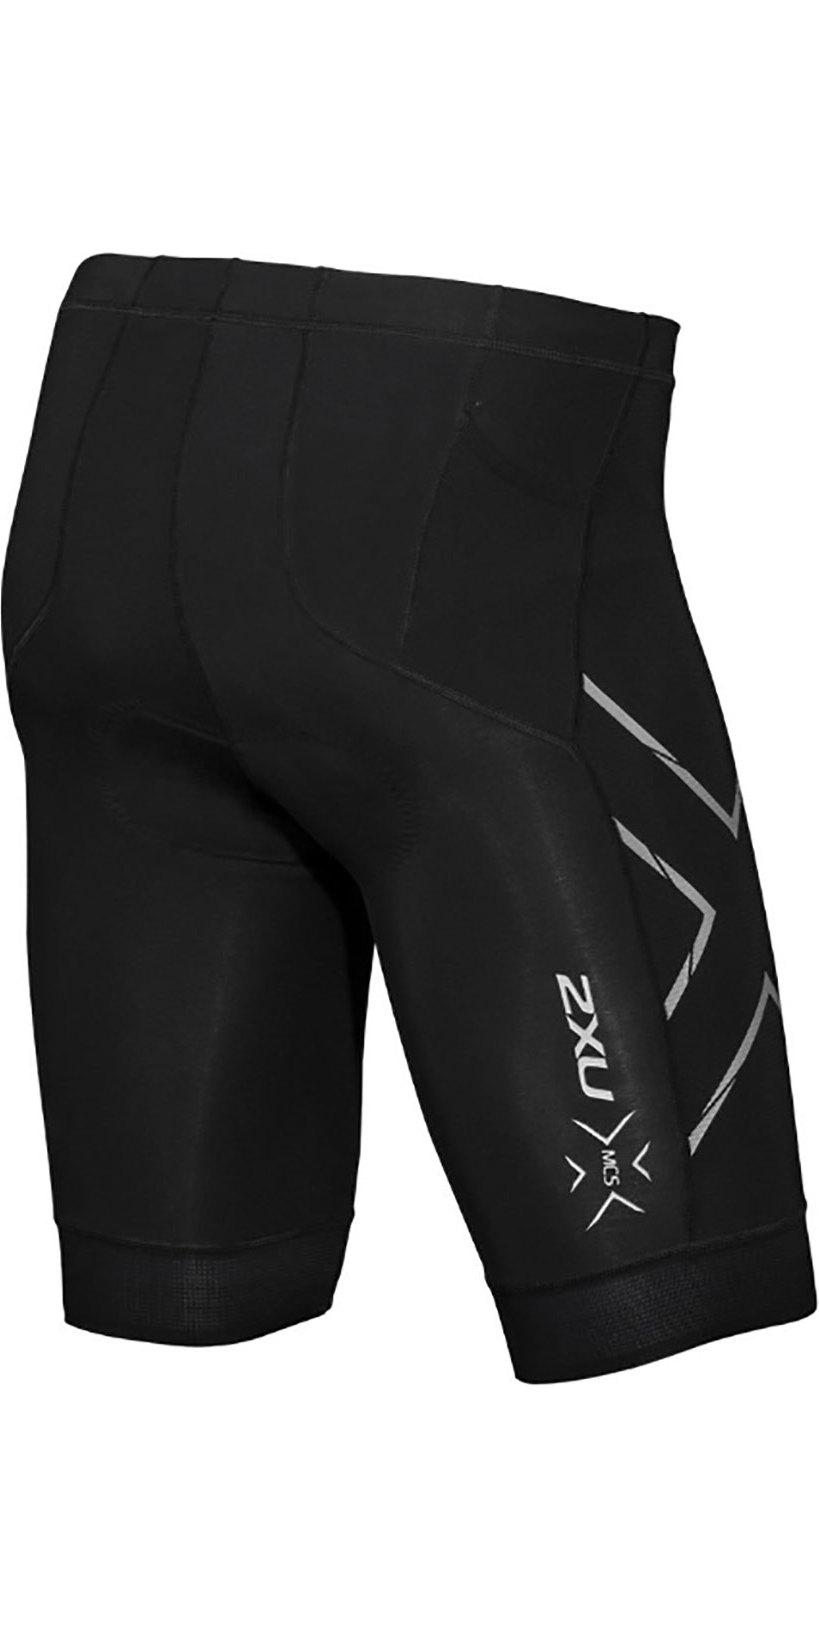 2019 2XU Mens Compression Tri Shorts Black MT5520b